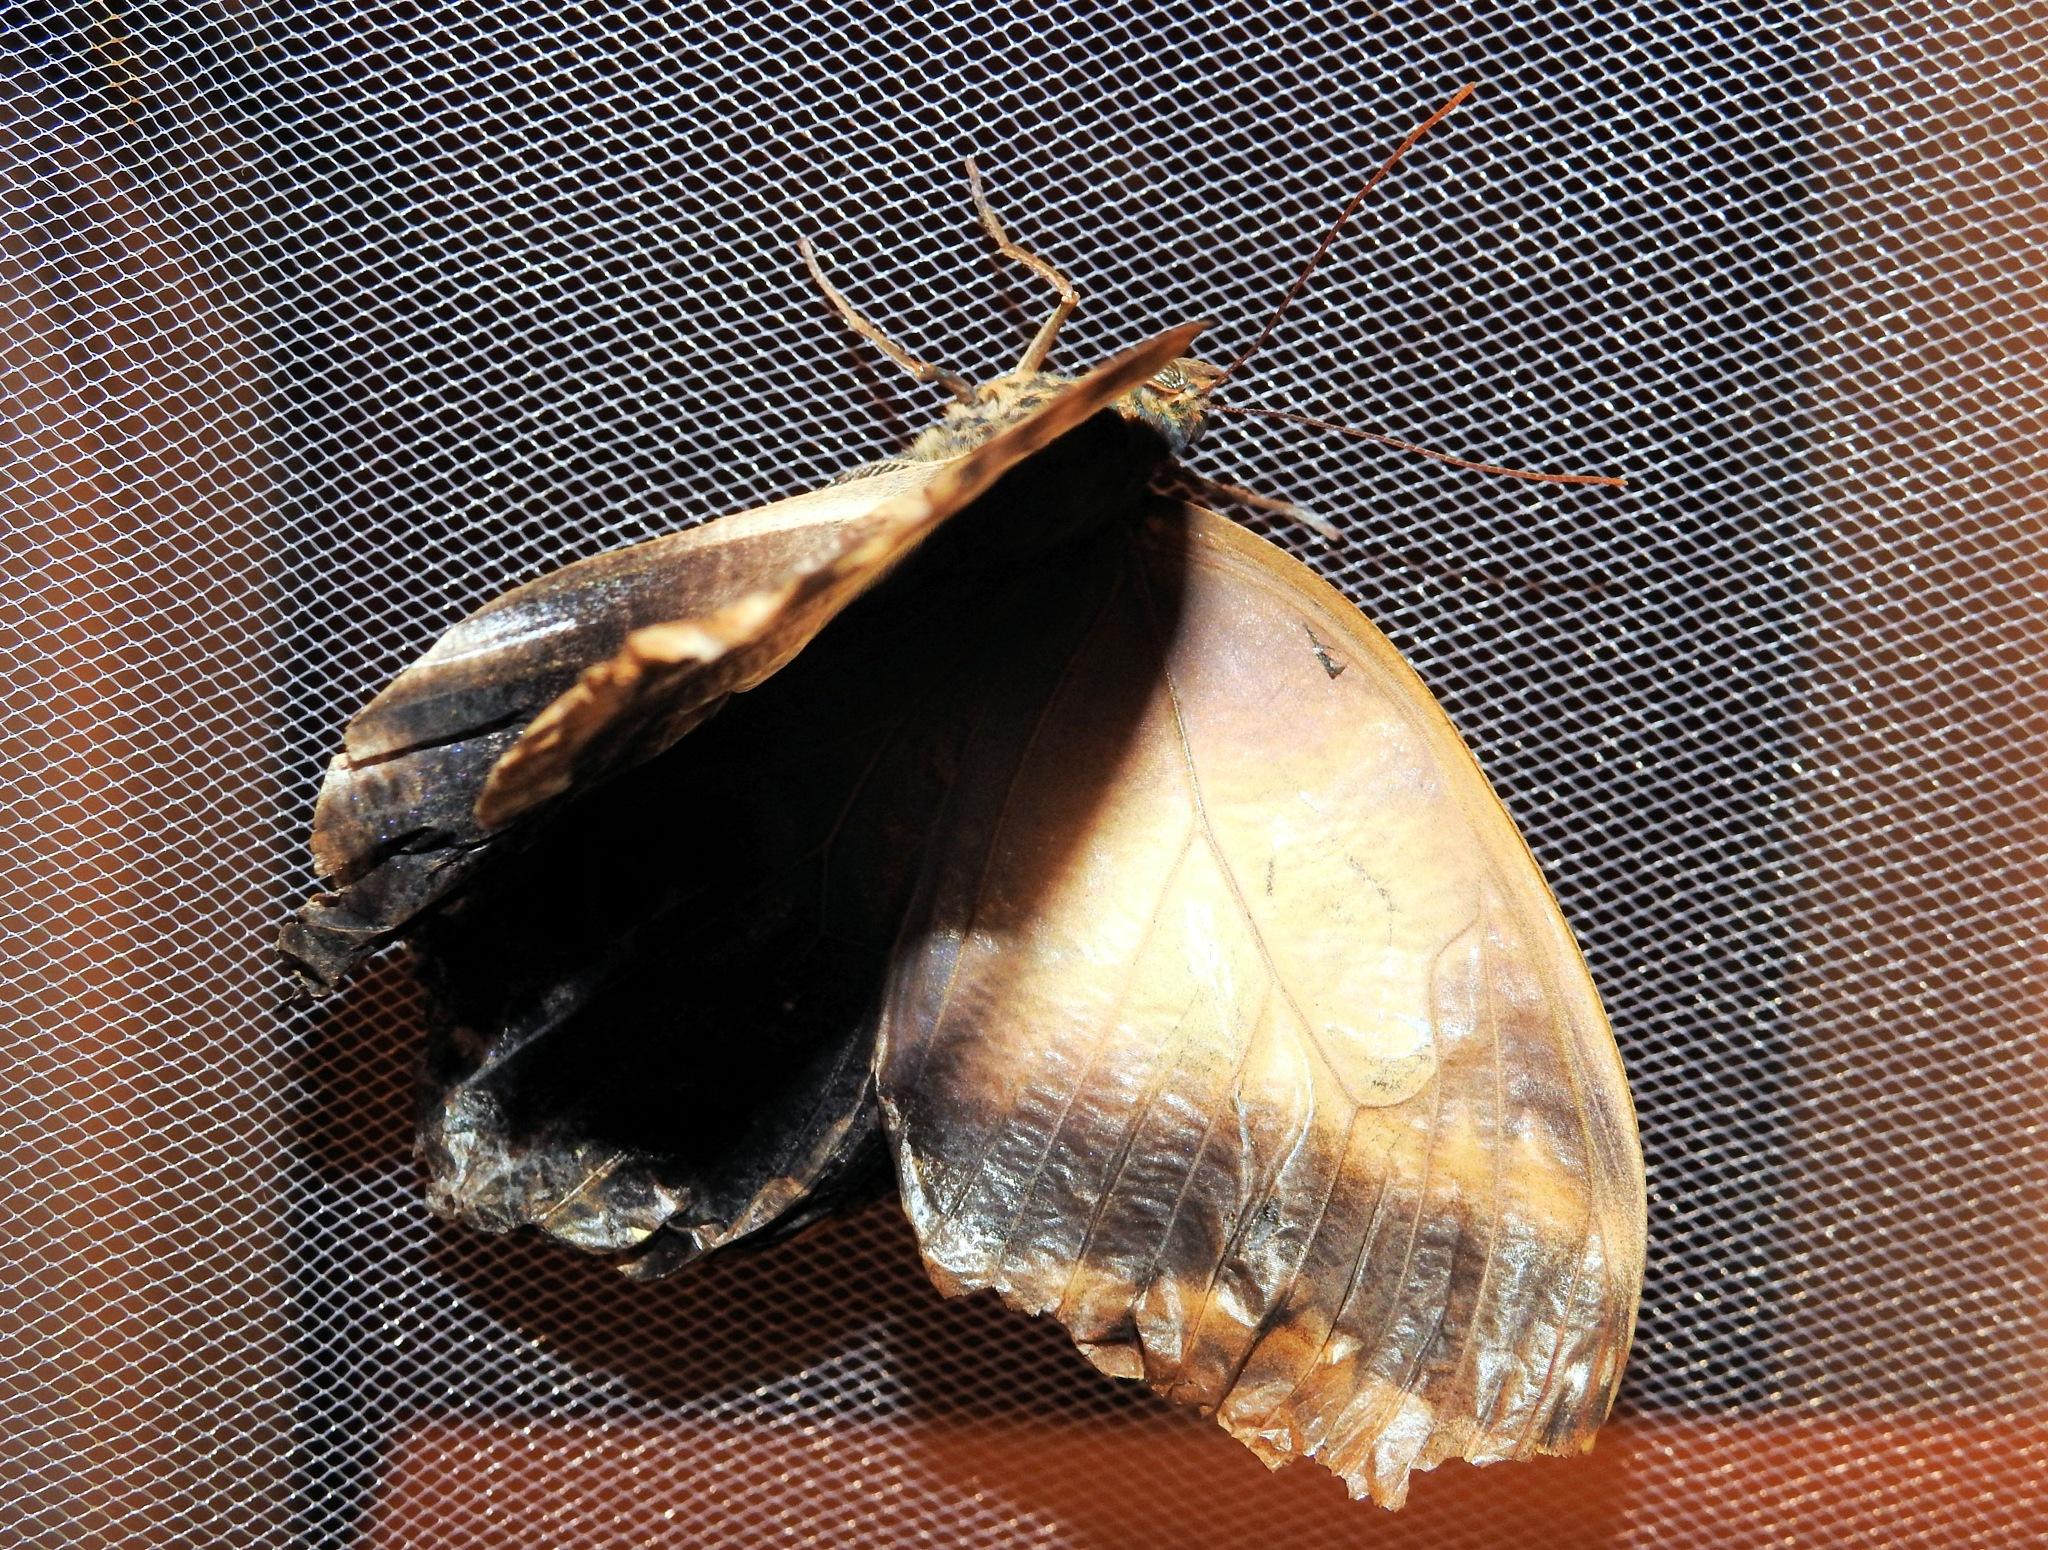 Naples - World Butterflies - Live Butterflies Show - Etoile produzioni Papallona Butterfly - 18 by Mister Arnauna & Gatto Giuggiolone